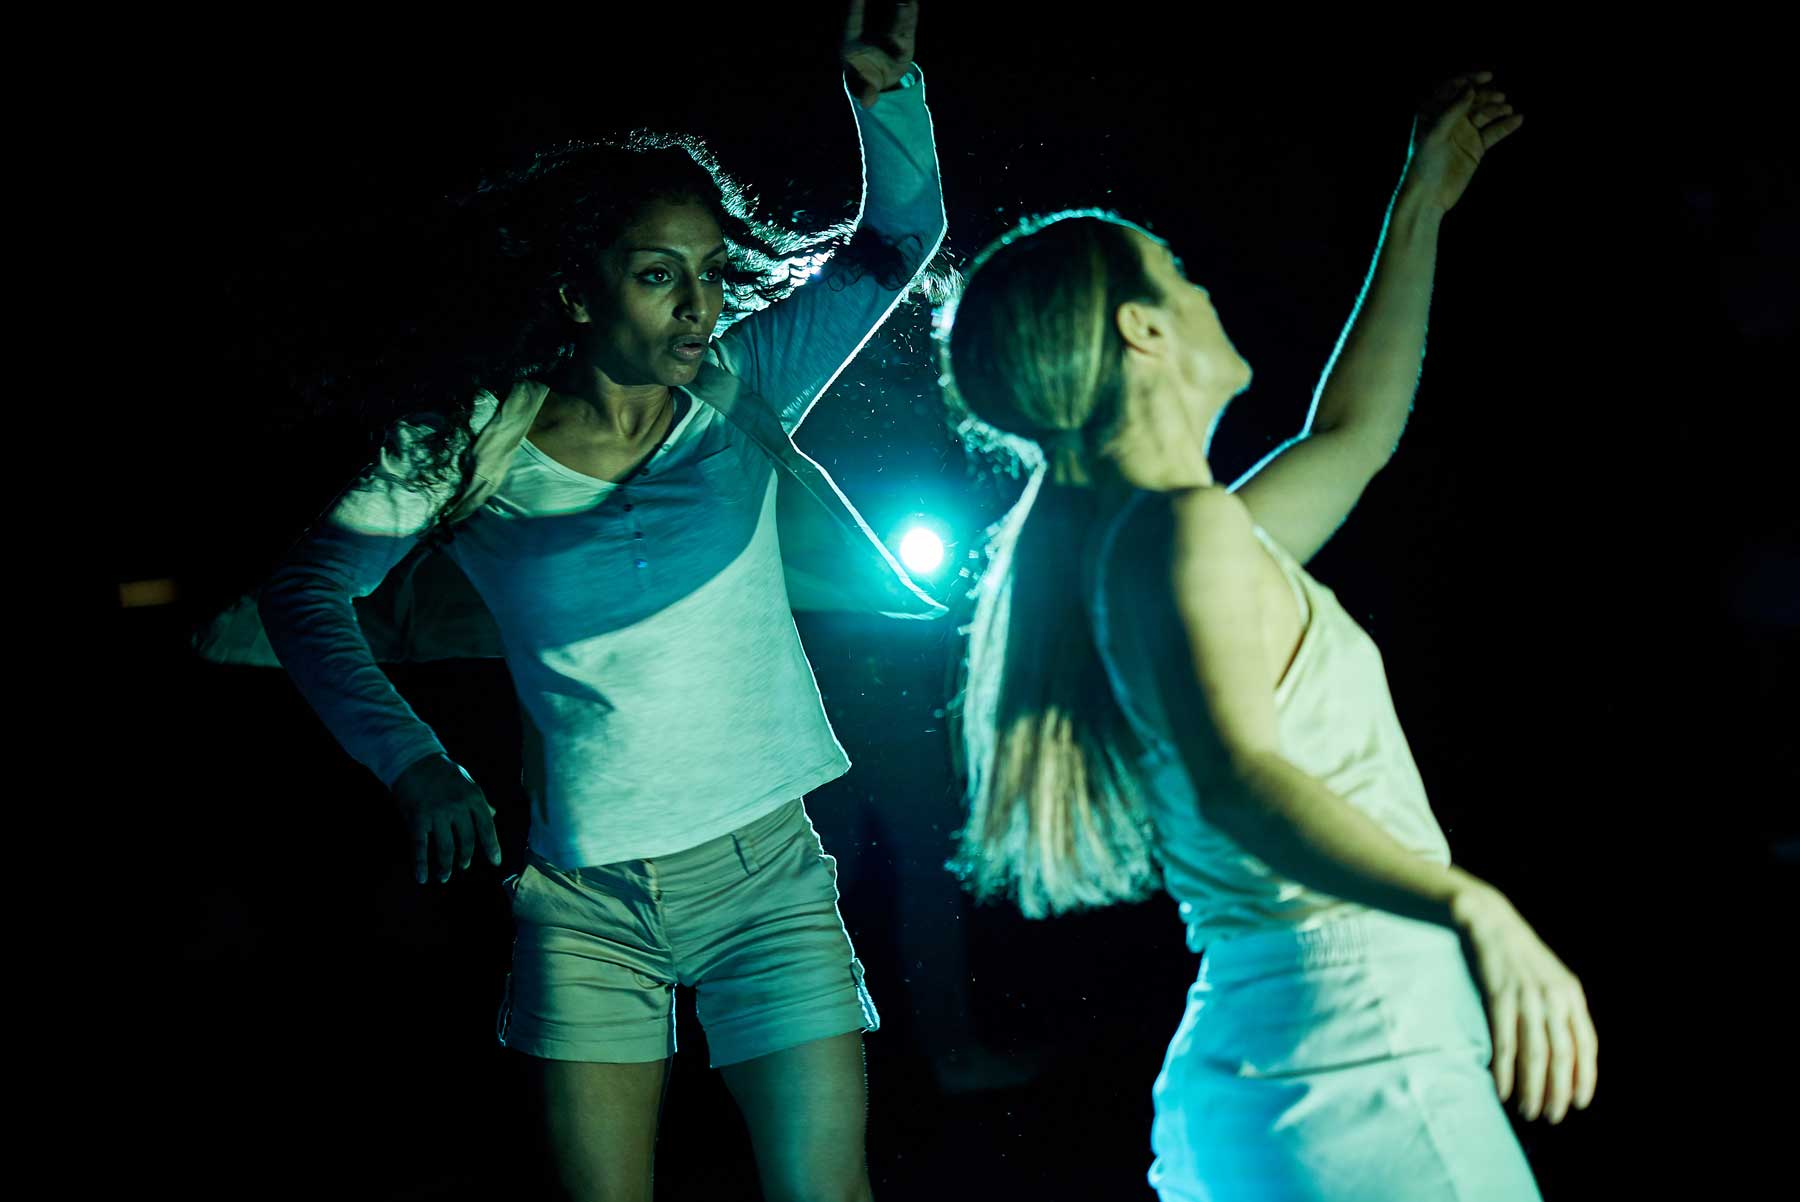 mardi-culturel-td-danse-danse-kyra-jean-green-trip-the-light-fantastic-7.jpg